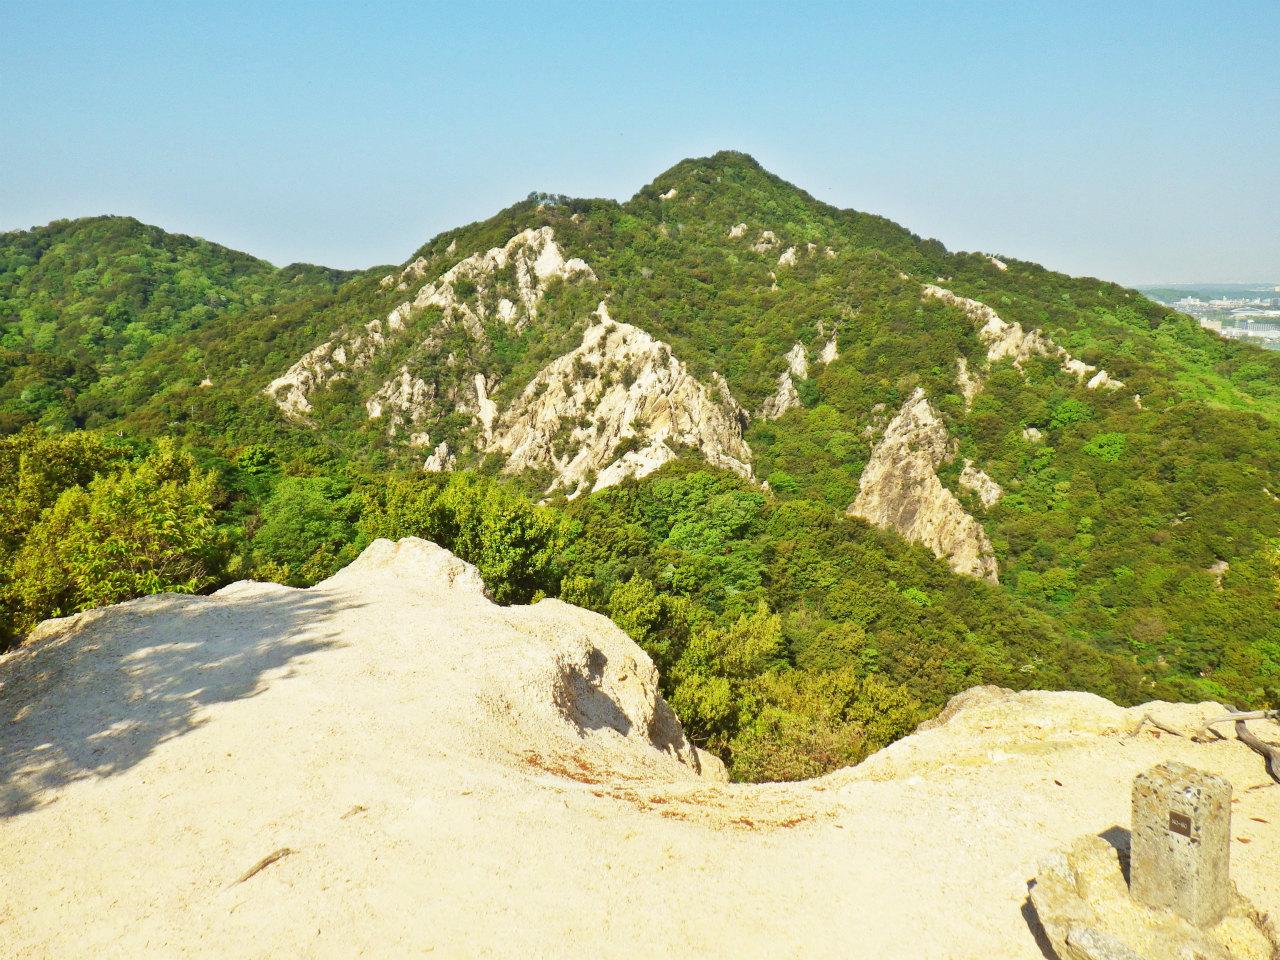 08b 東山からの眺め